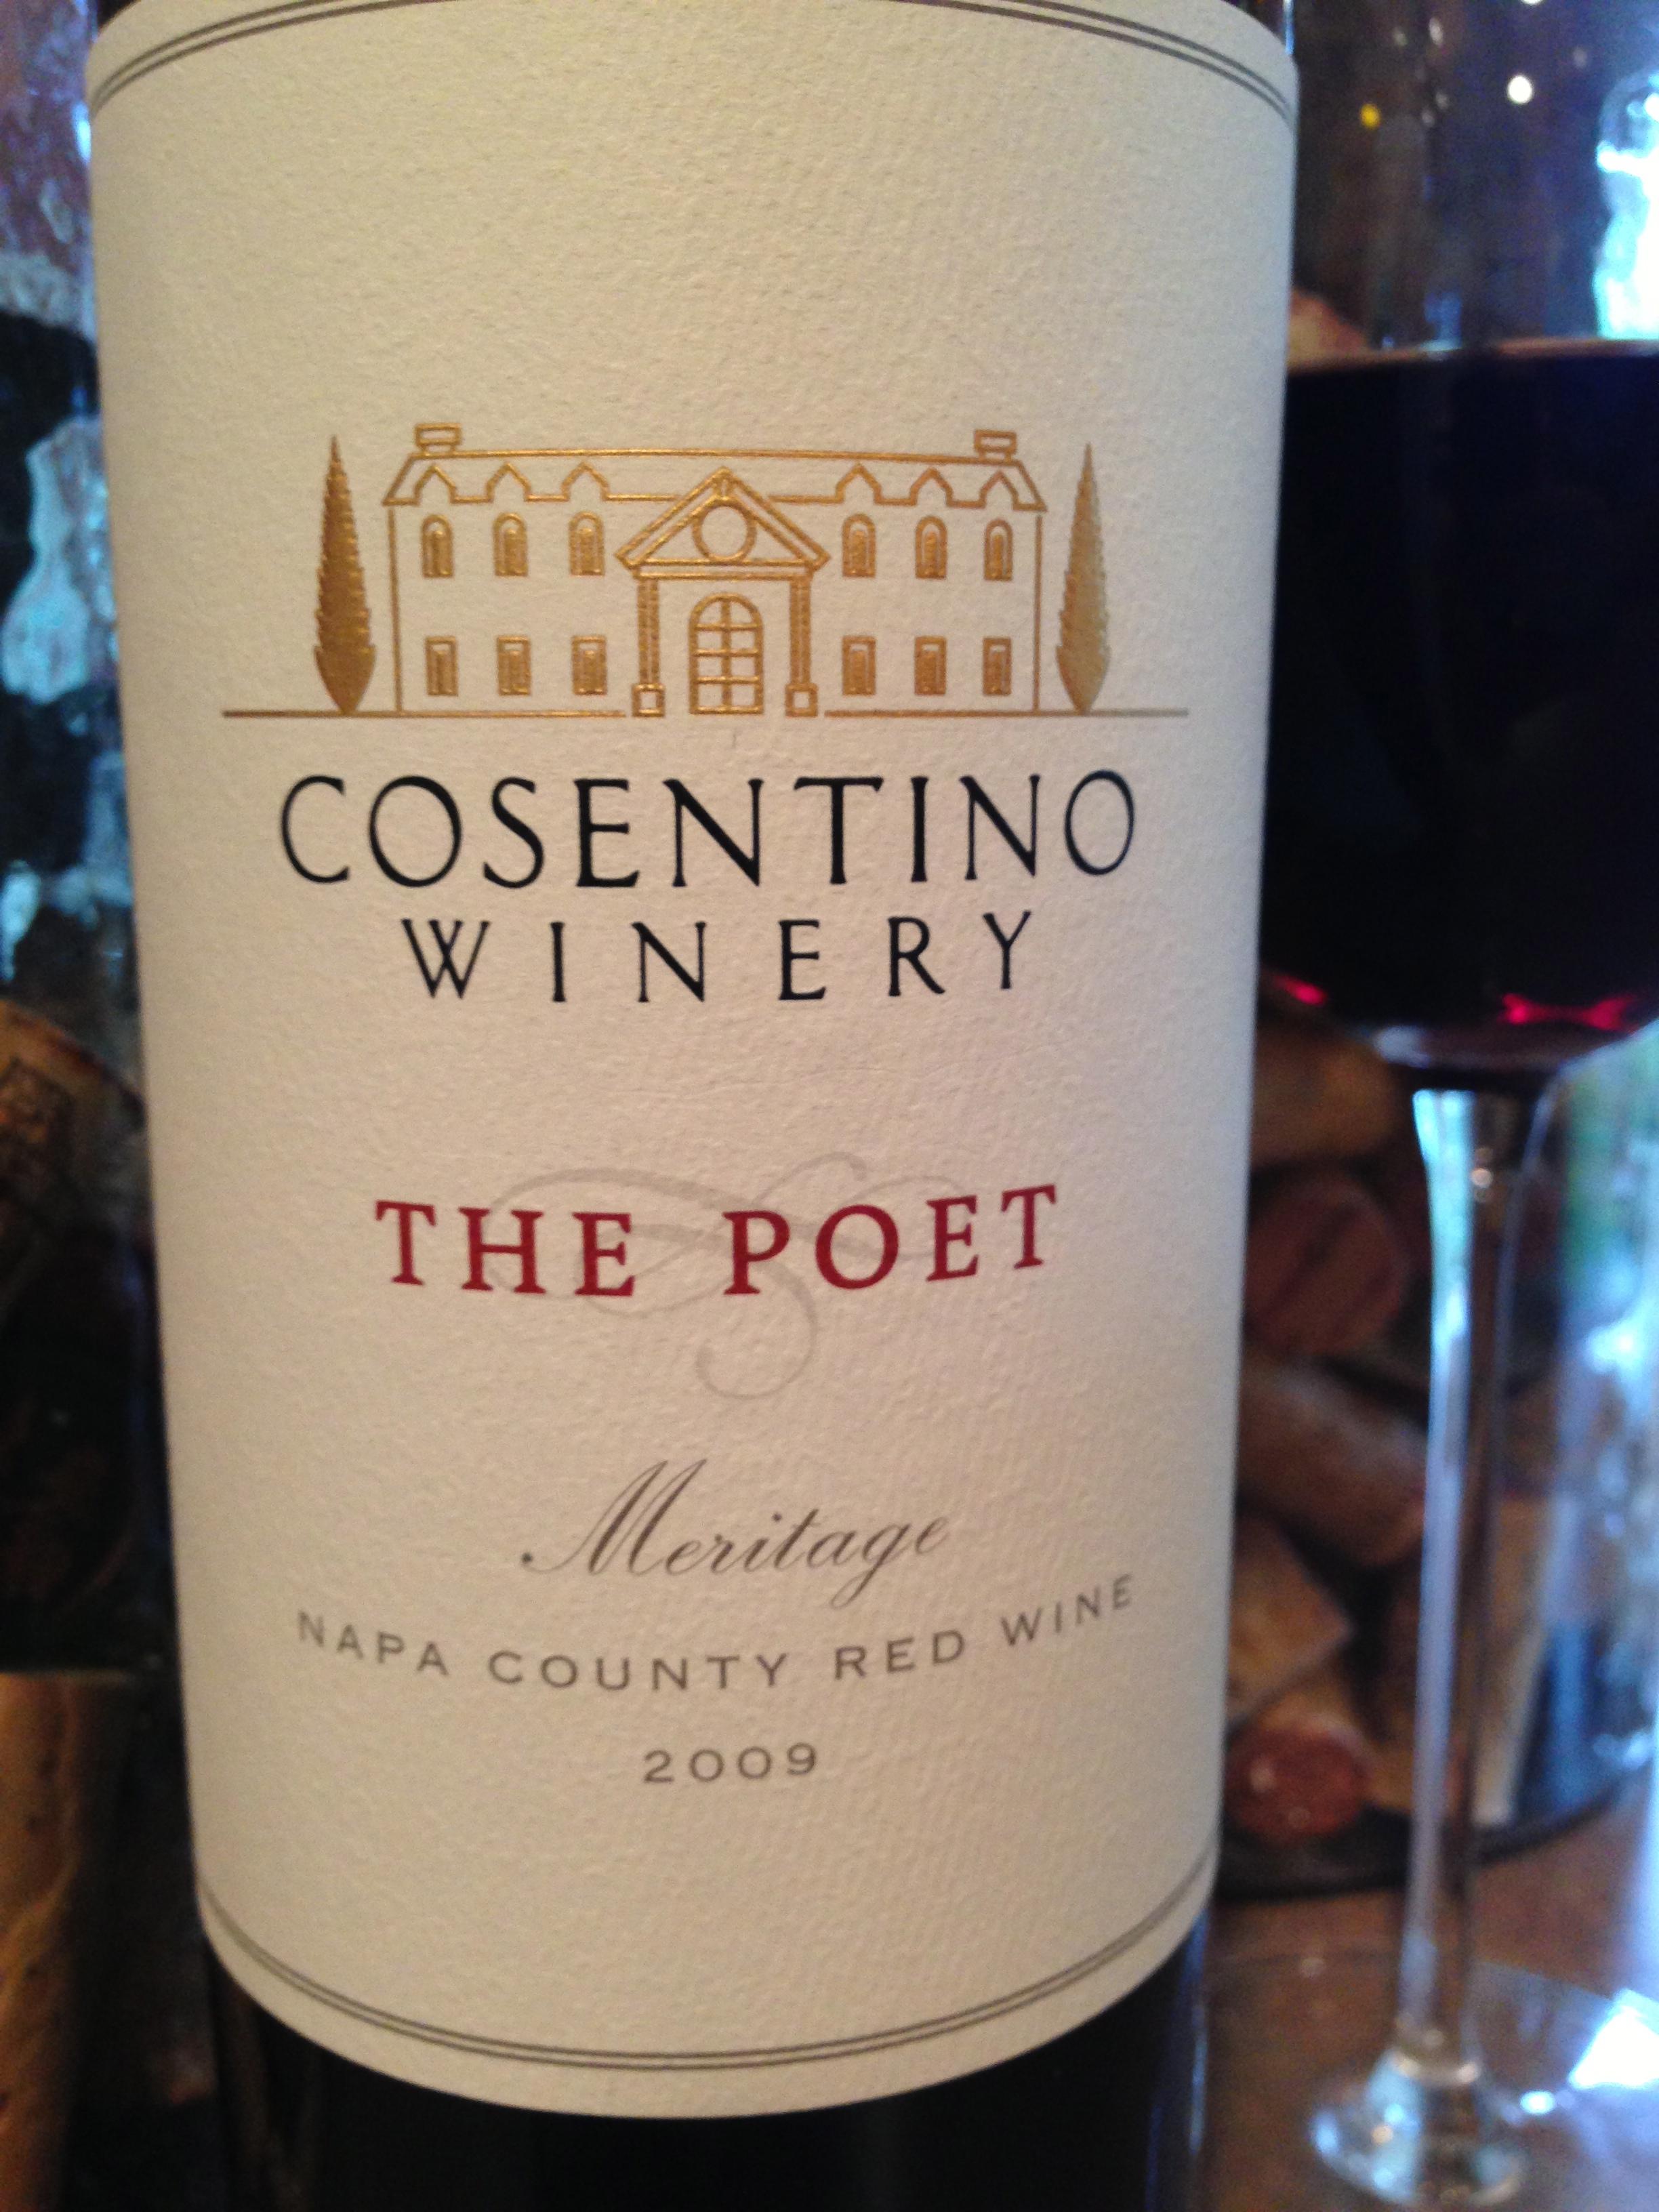 Cosentino 'The Poet' 2009 | Caspernick's Blog